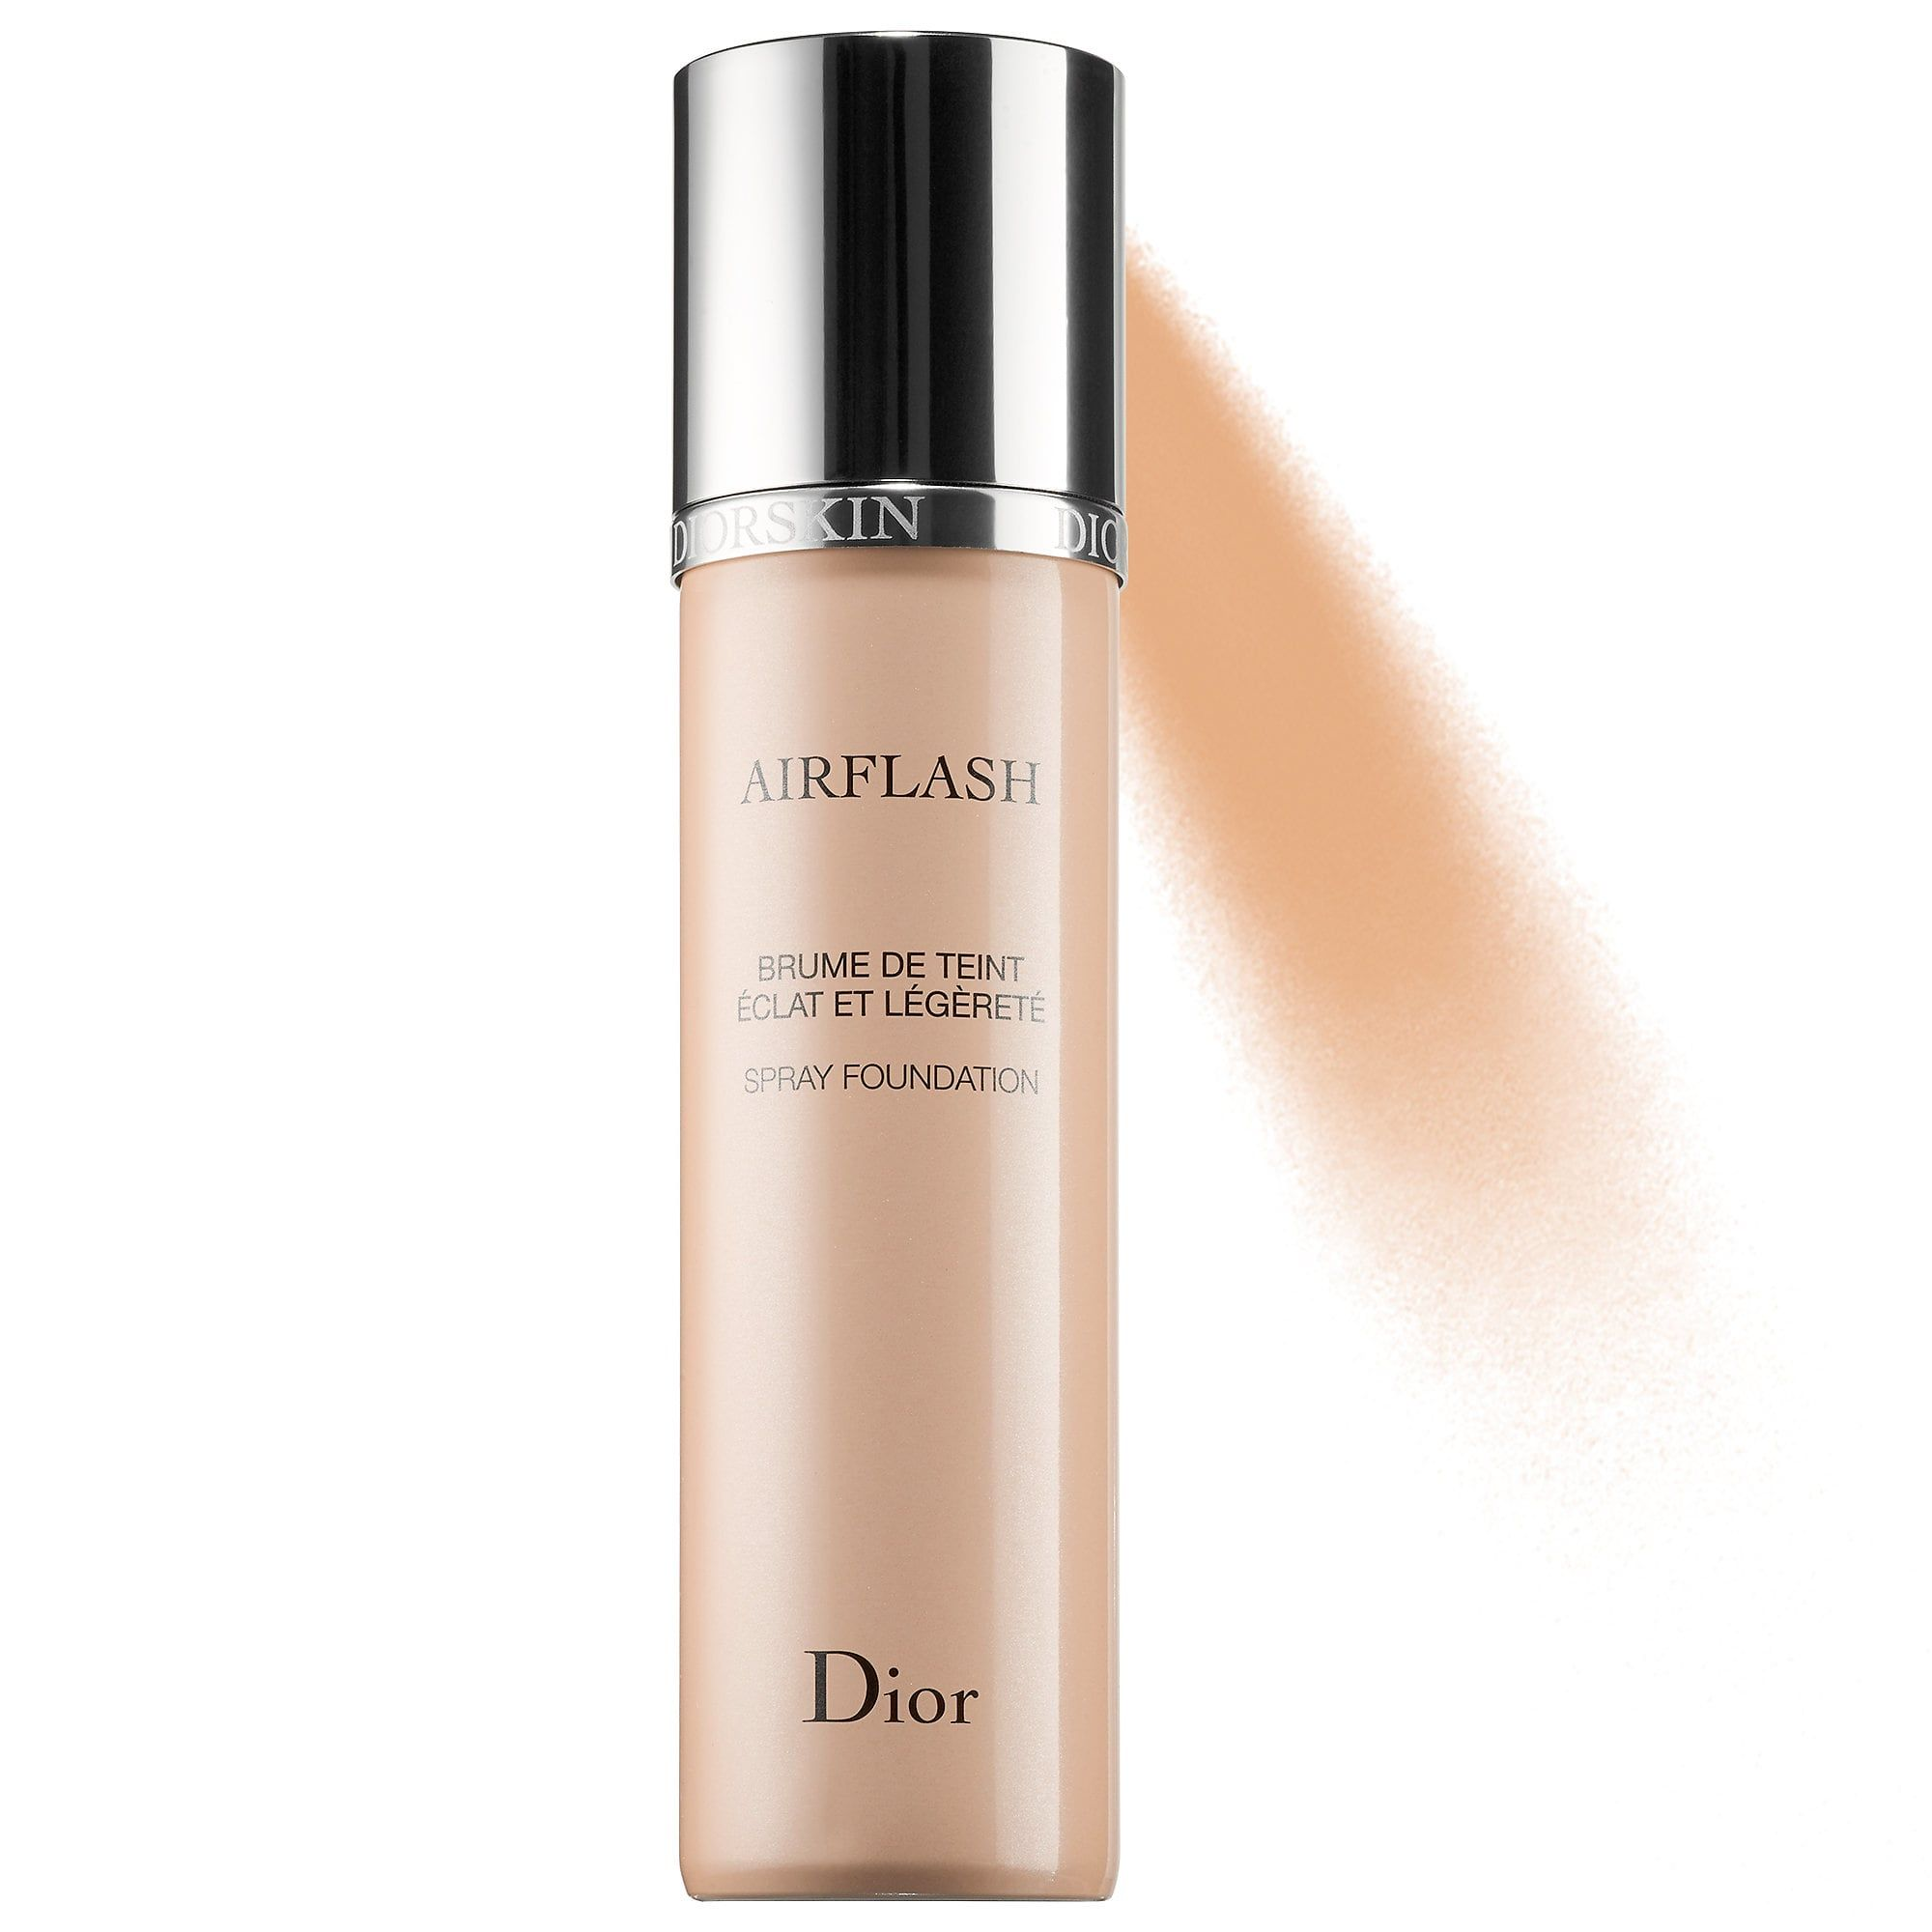 Dior Airflash Spray Foundation Spray foundation, Best